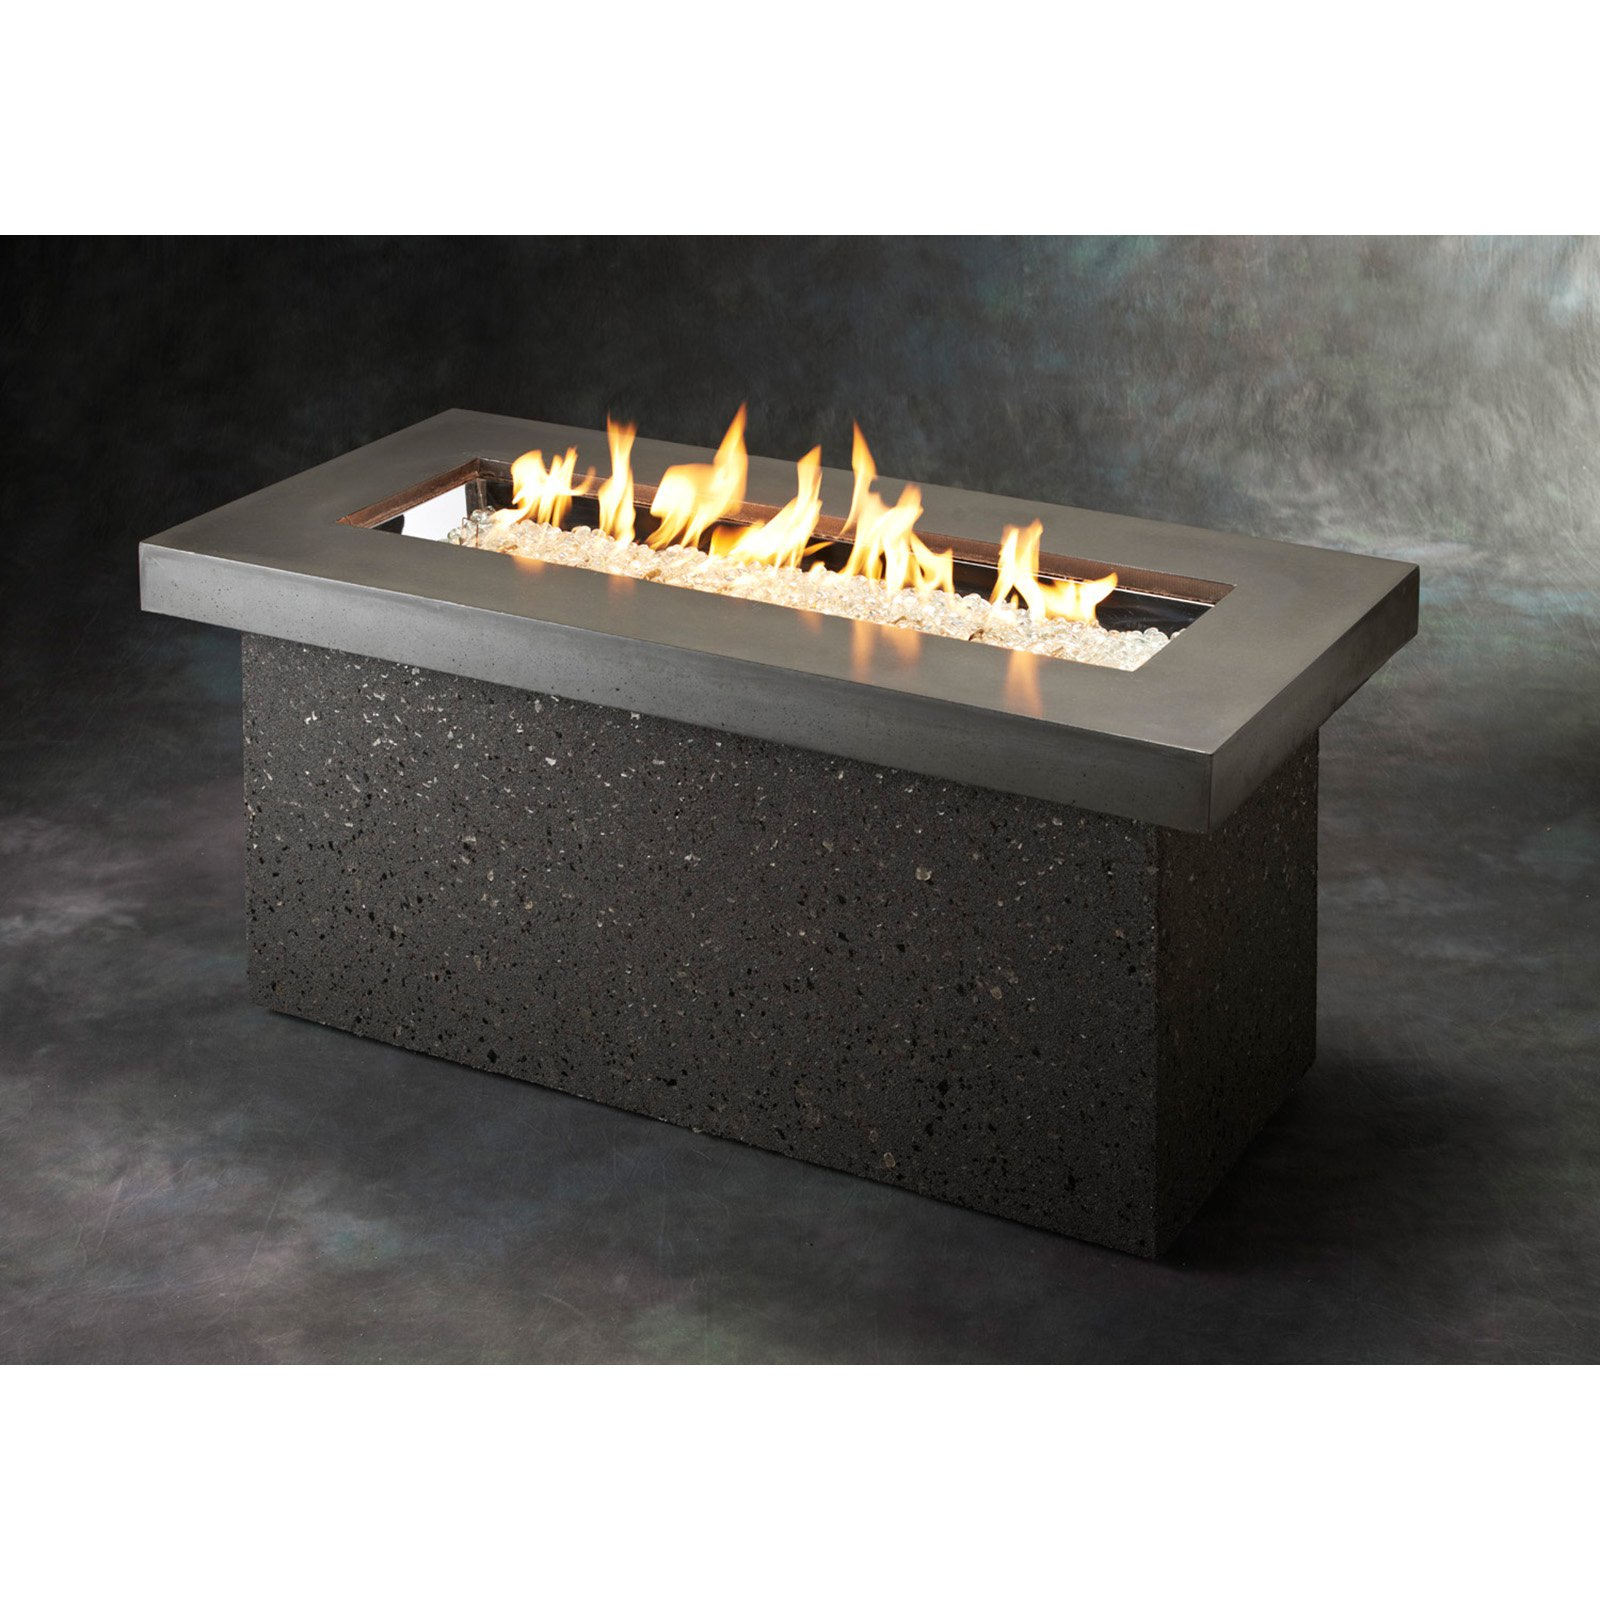 Outdoor GreatRoom Key Largo 54 in. Fire Table